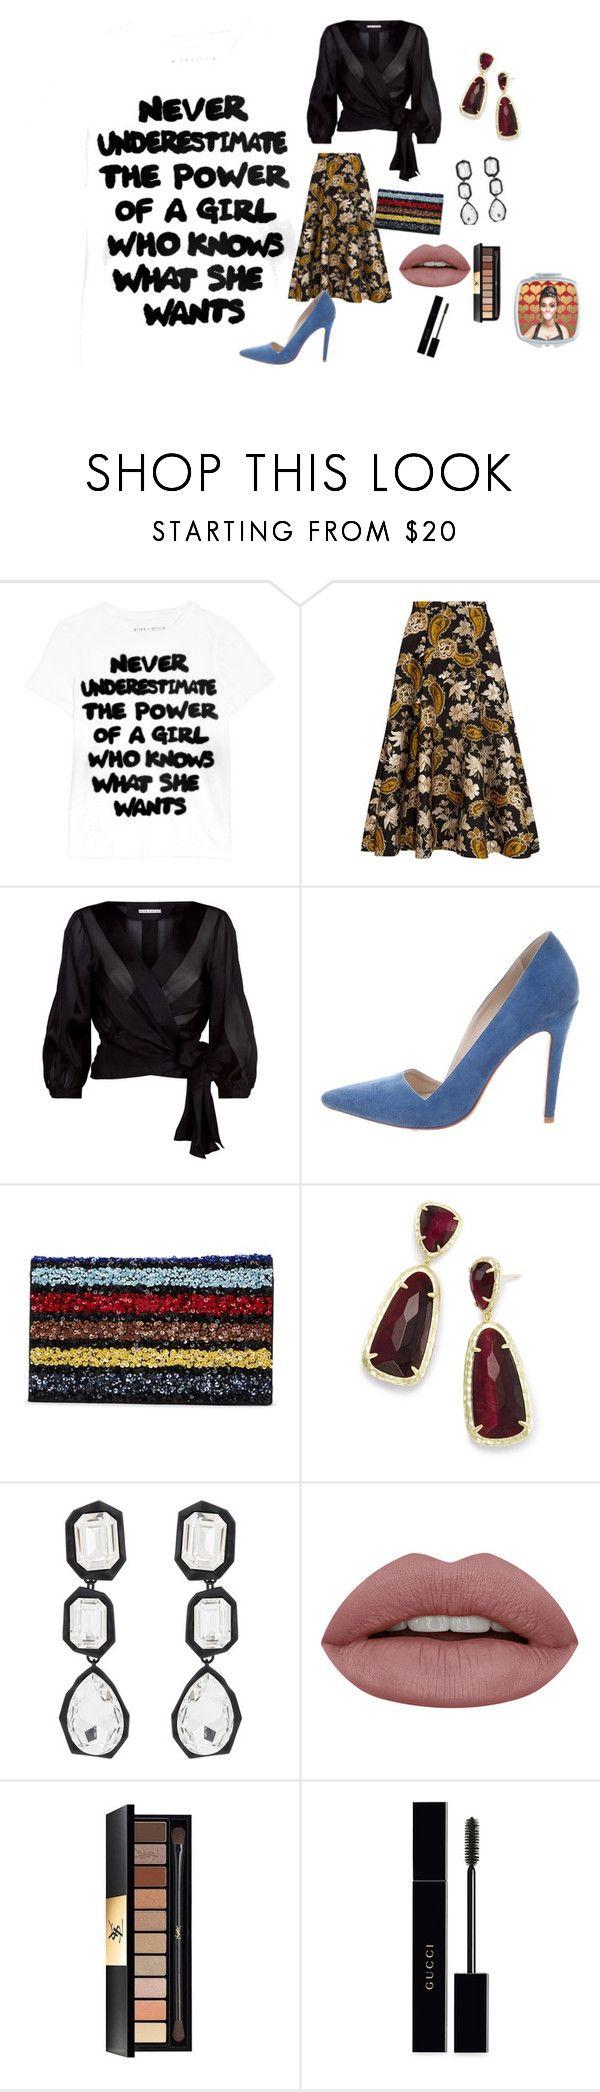 """ALICE+OLIVIA"" by rosastreet on Polyvore featuring moda, Alice + Olivia, Kendra Scott, AMBUSH, Yves Saint Laurent e Gucci"